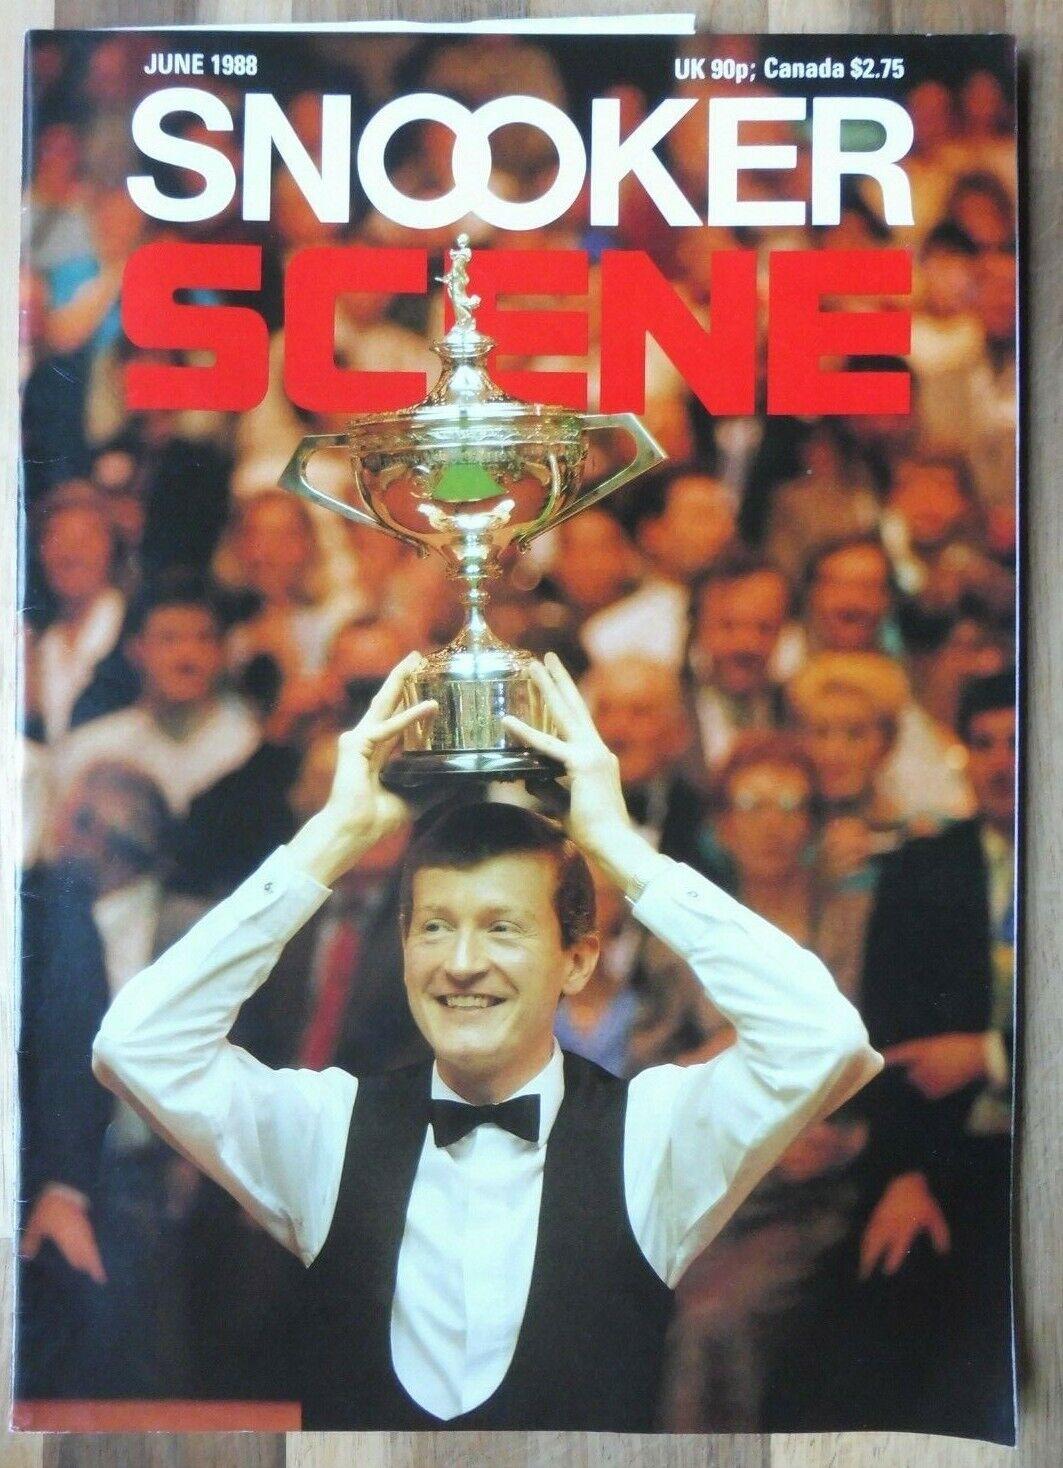 Snooker Scene Magazine, June 1988, Good Condition.